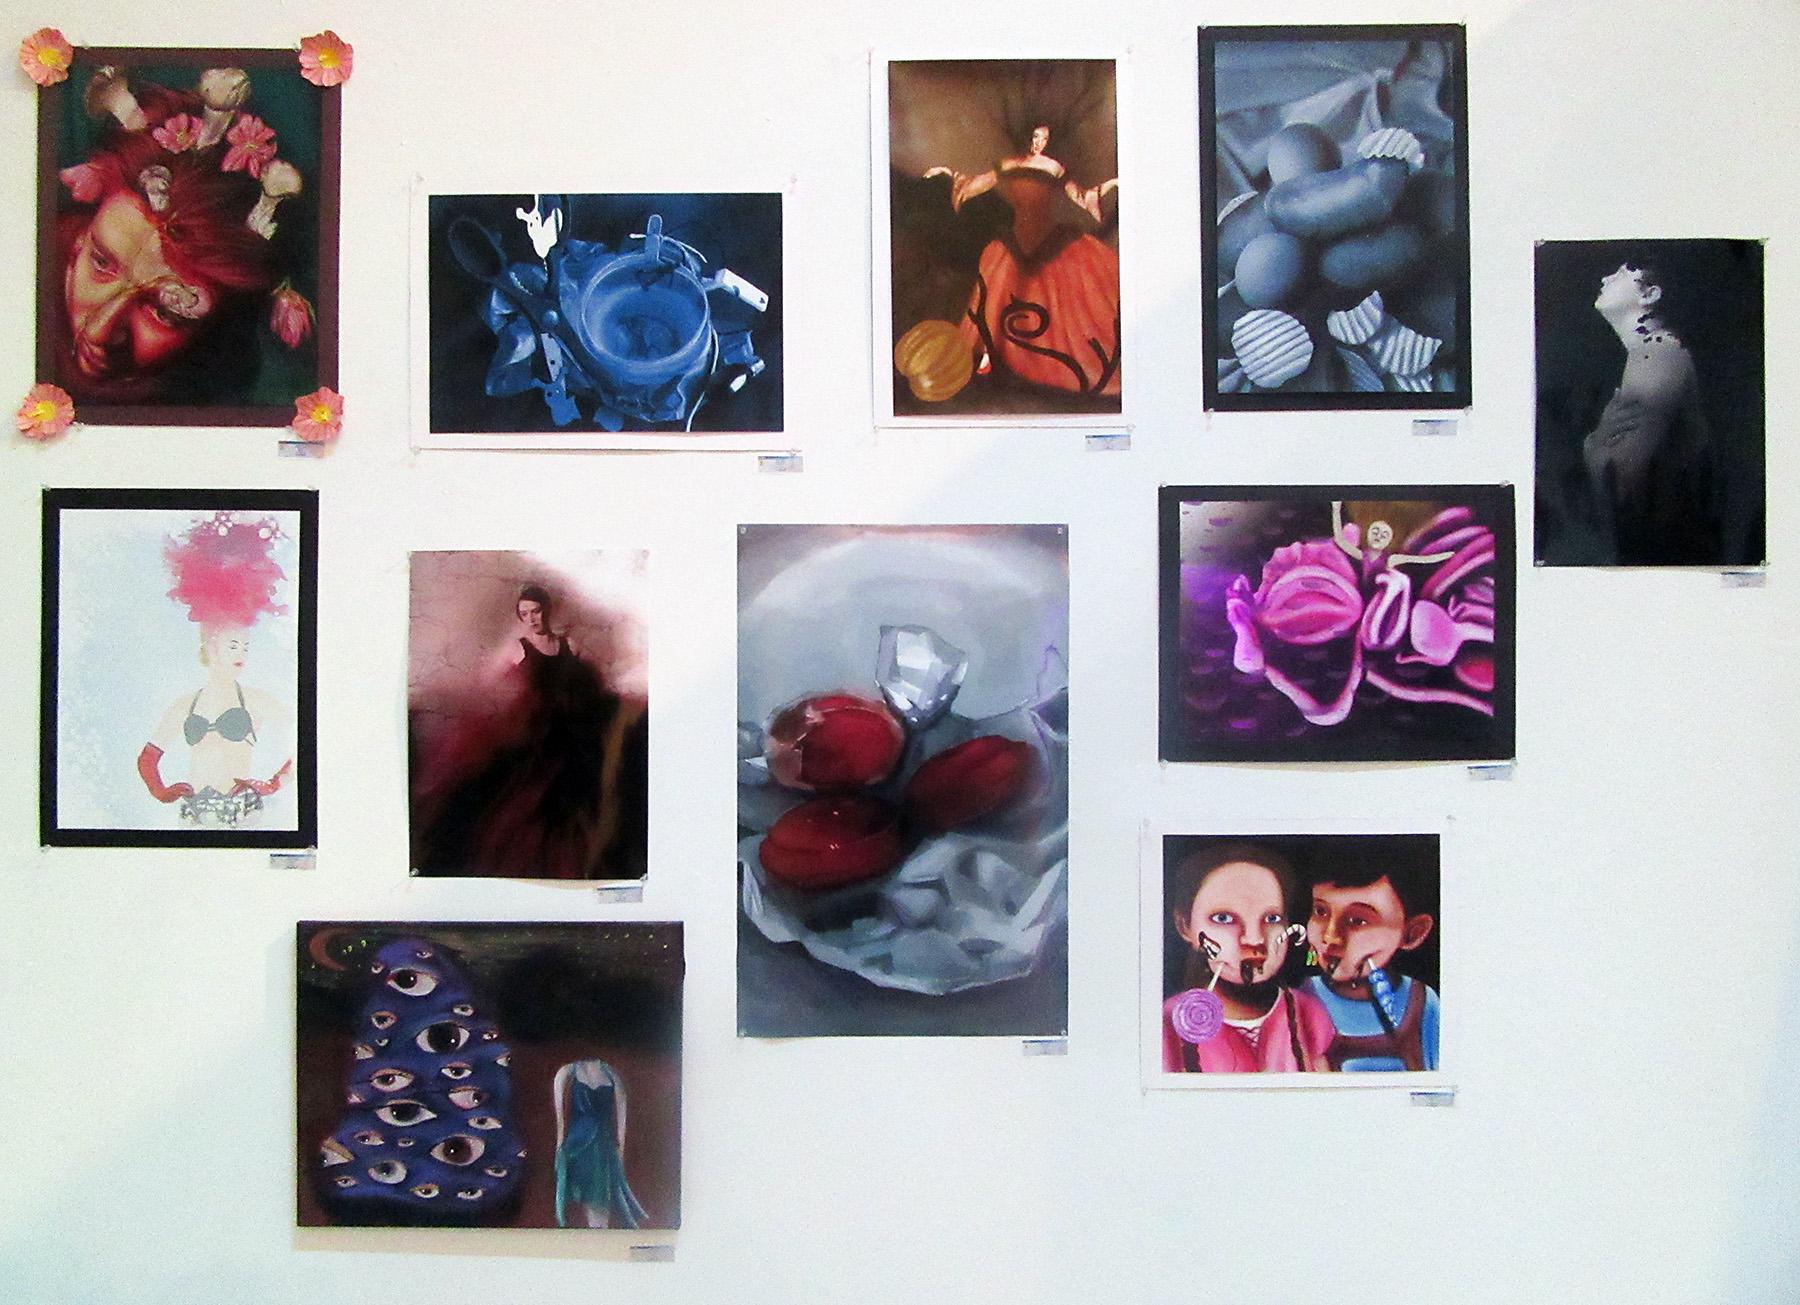 Gallery19